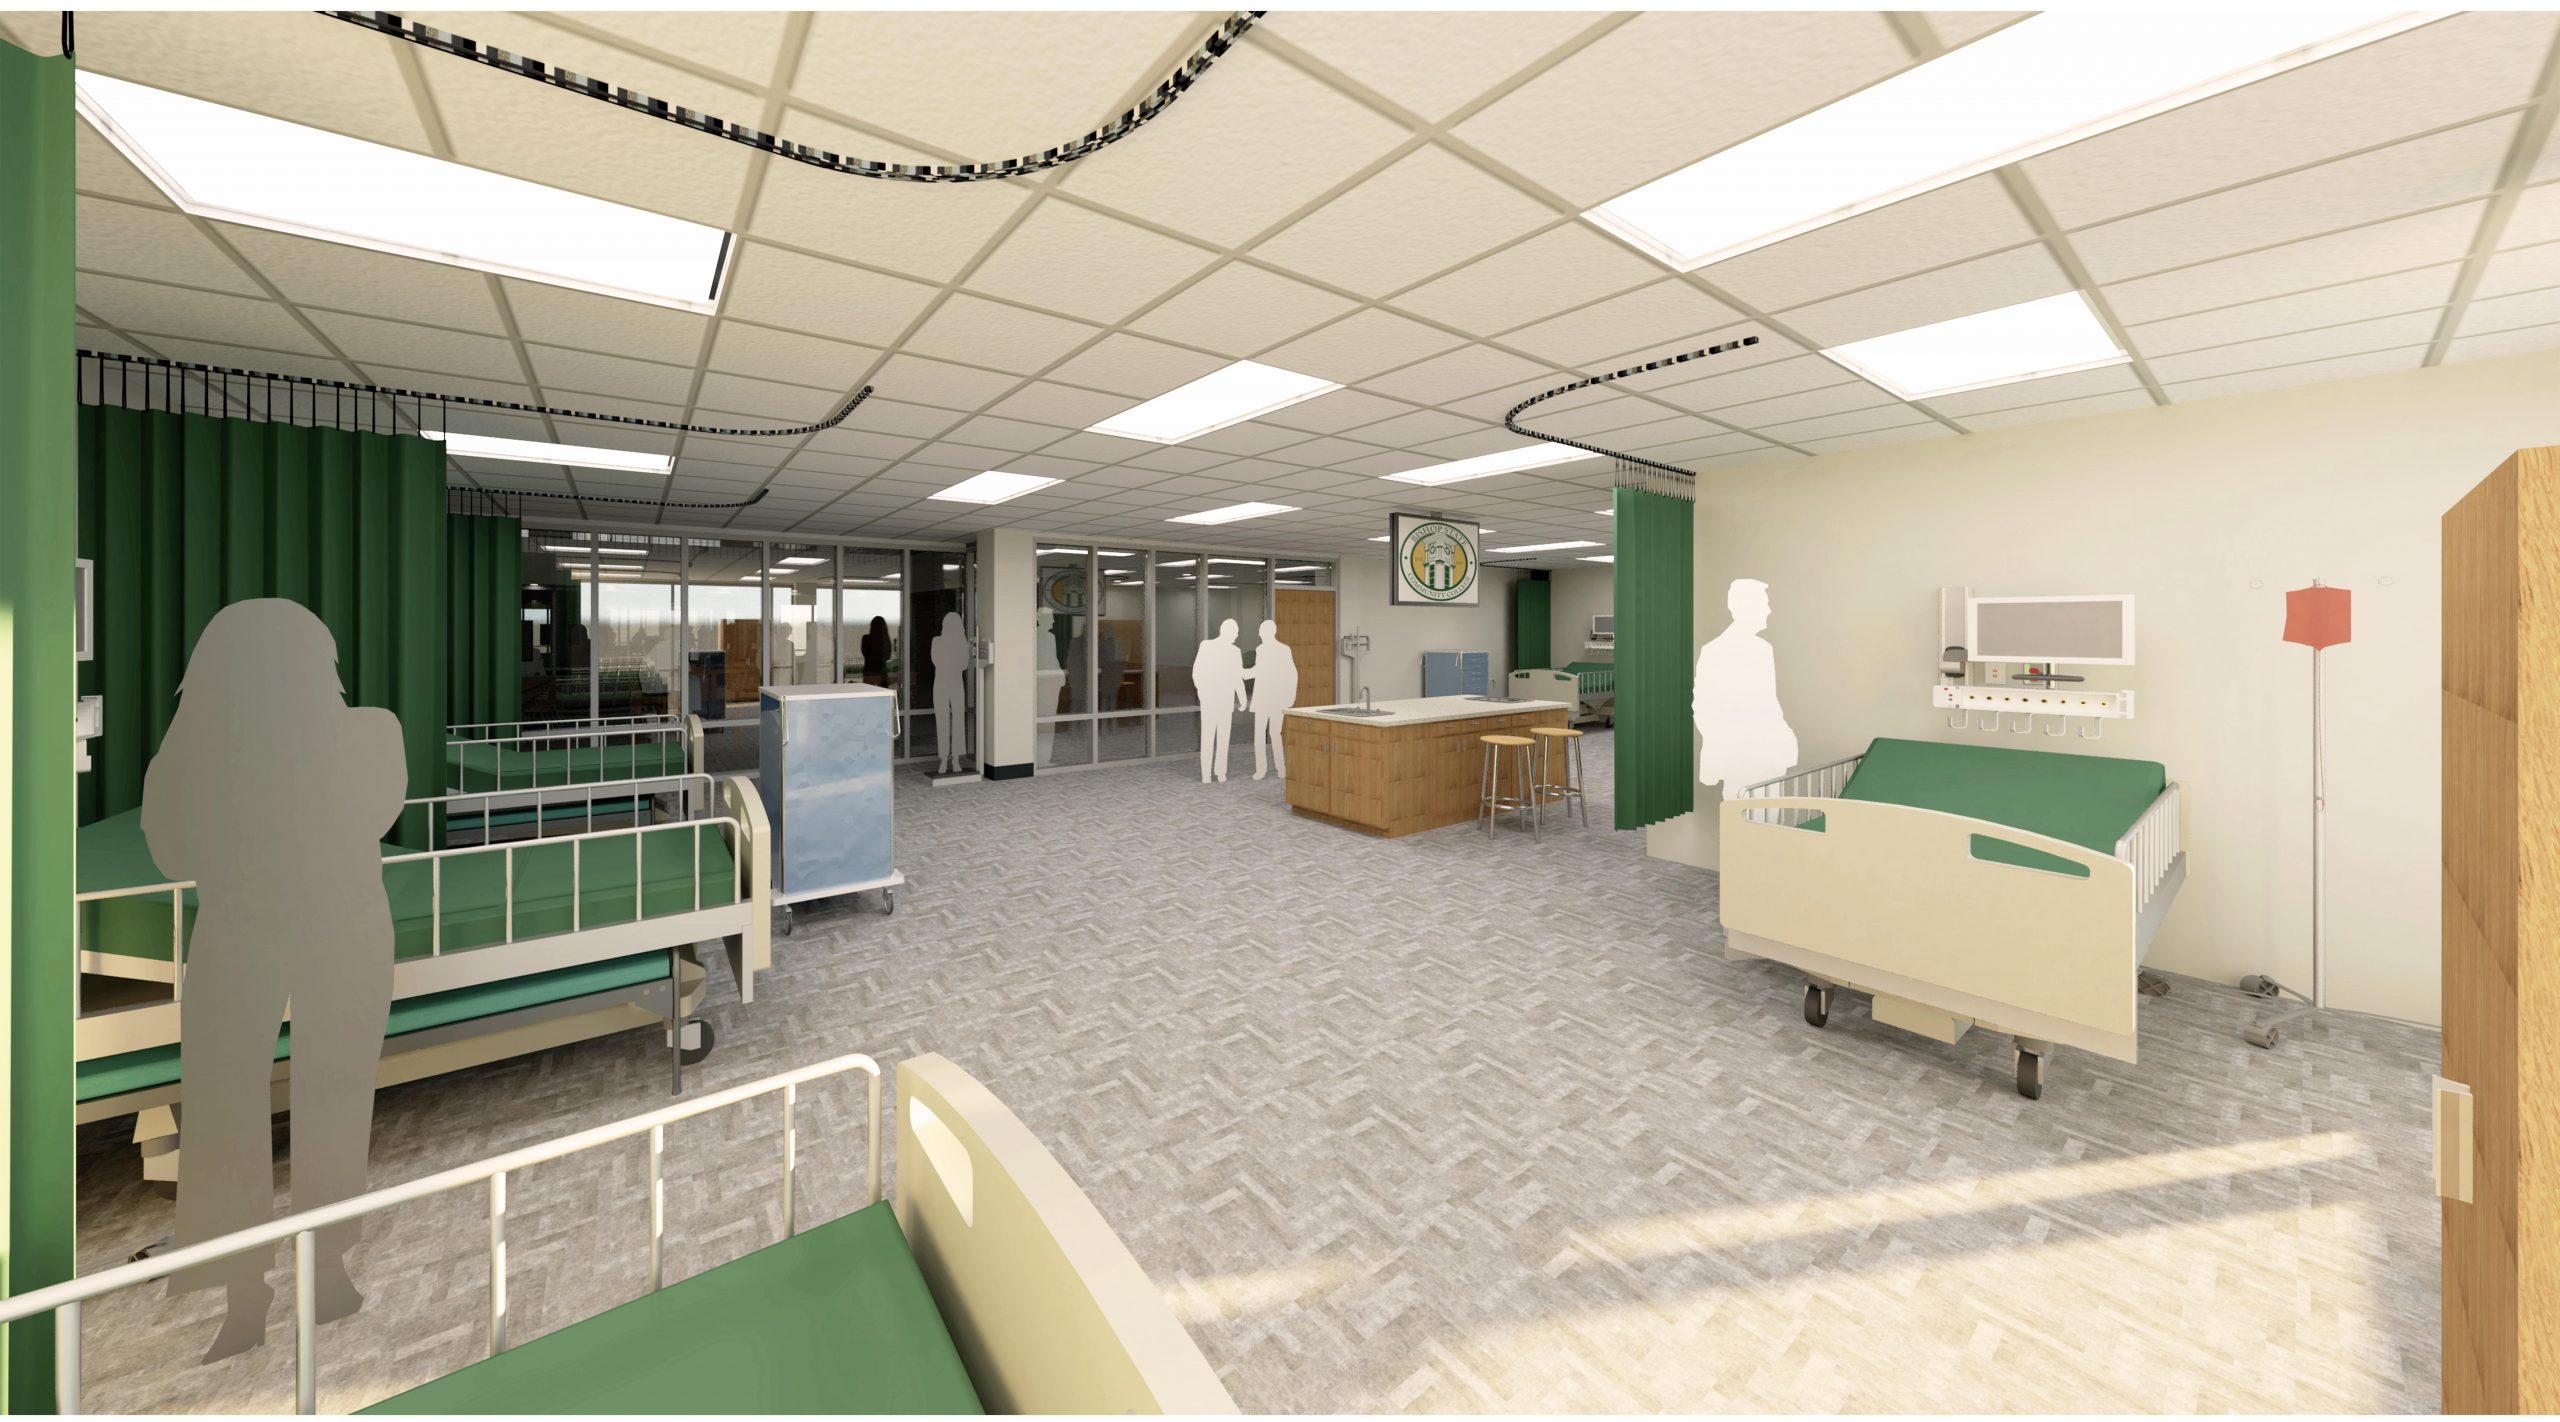 Health Sciences Building Nursing Lab- Bishop State Community College - Bishop State Foundation - Mobile AL